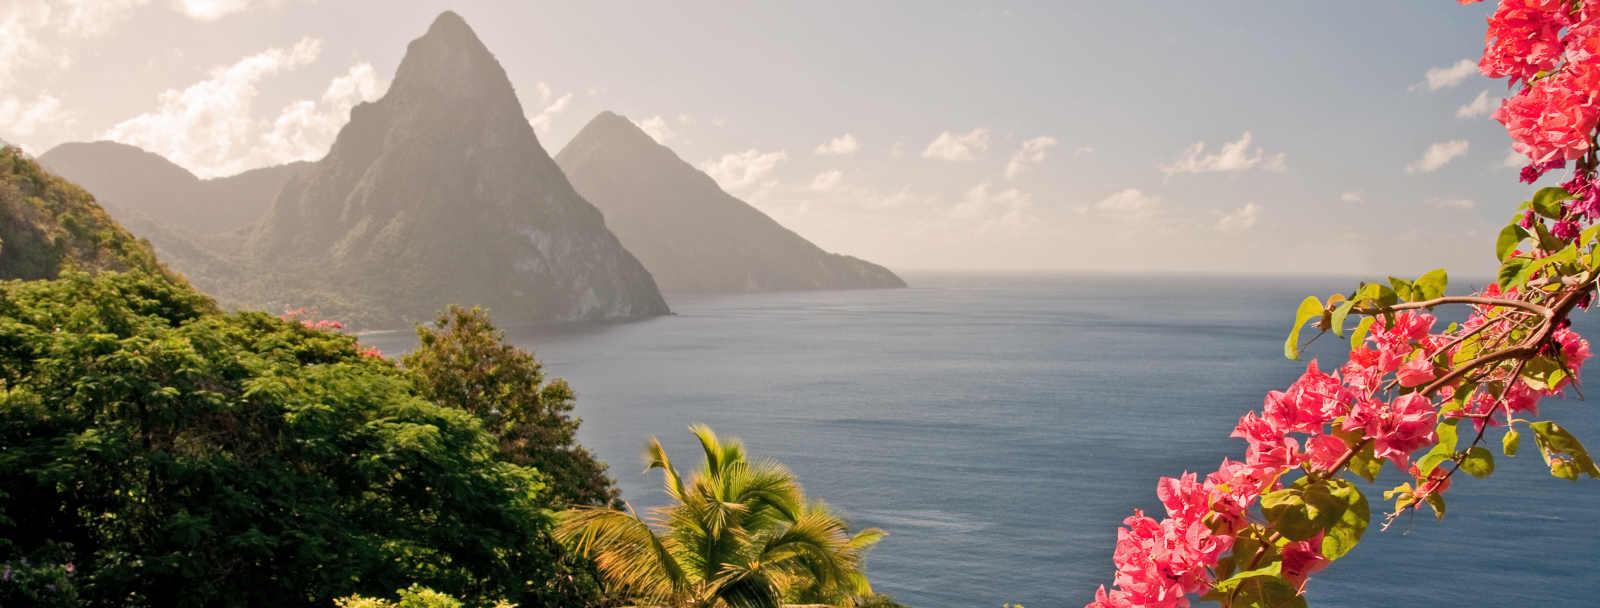 Windward Islands /Grenadines